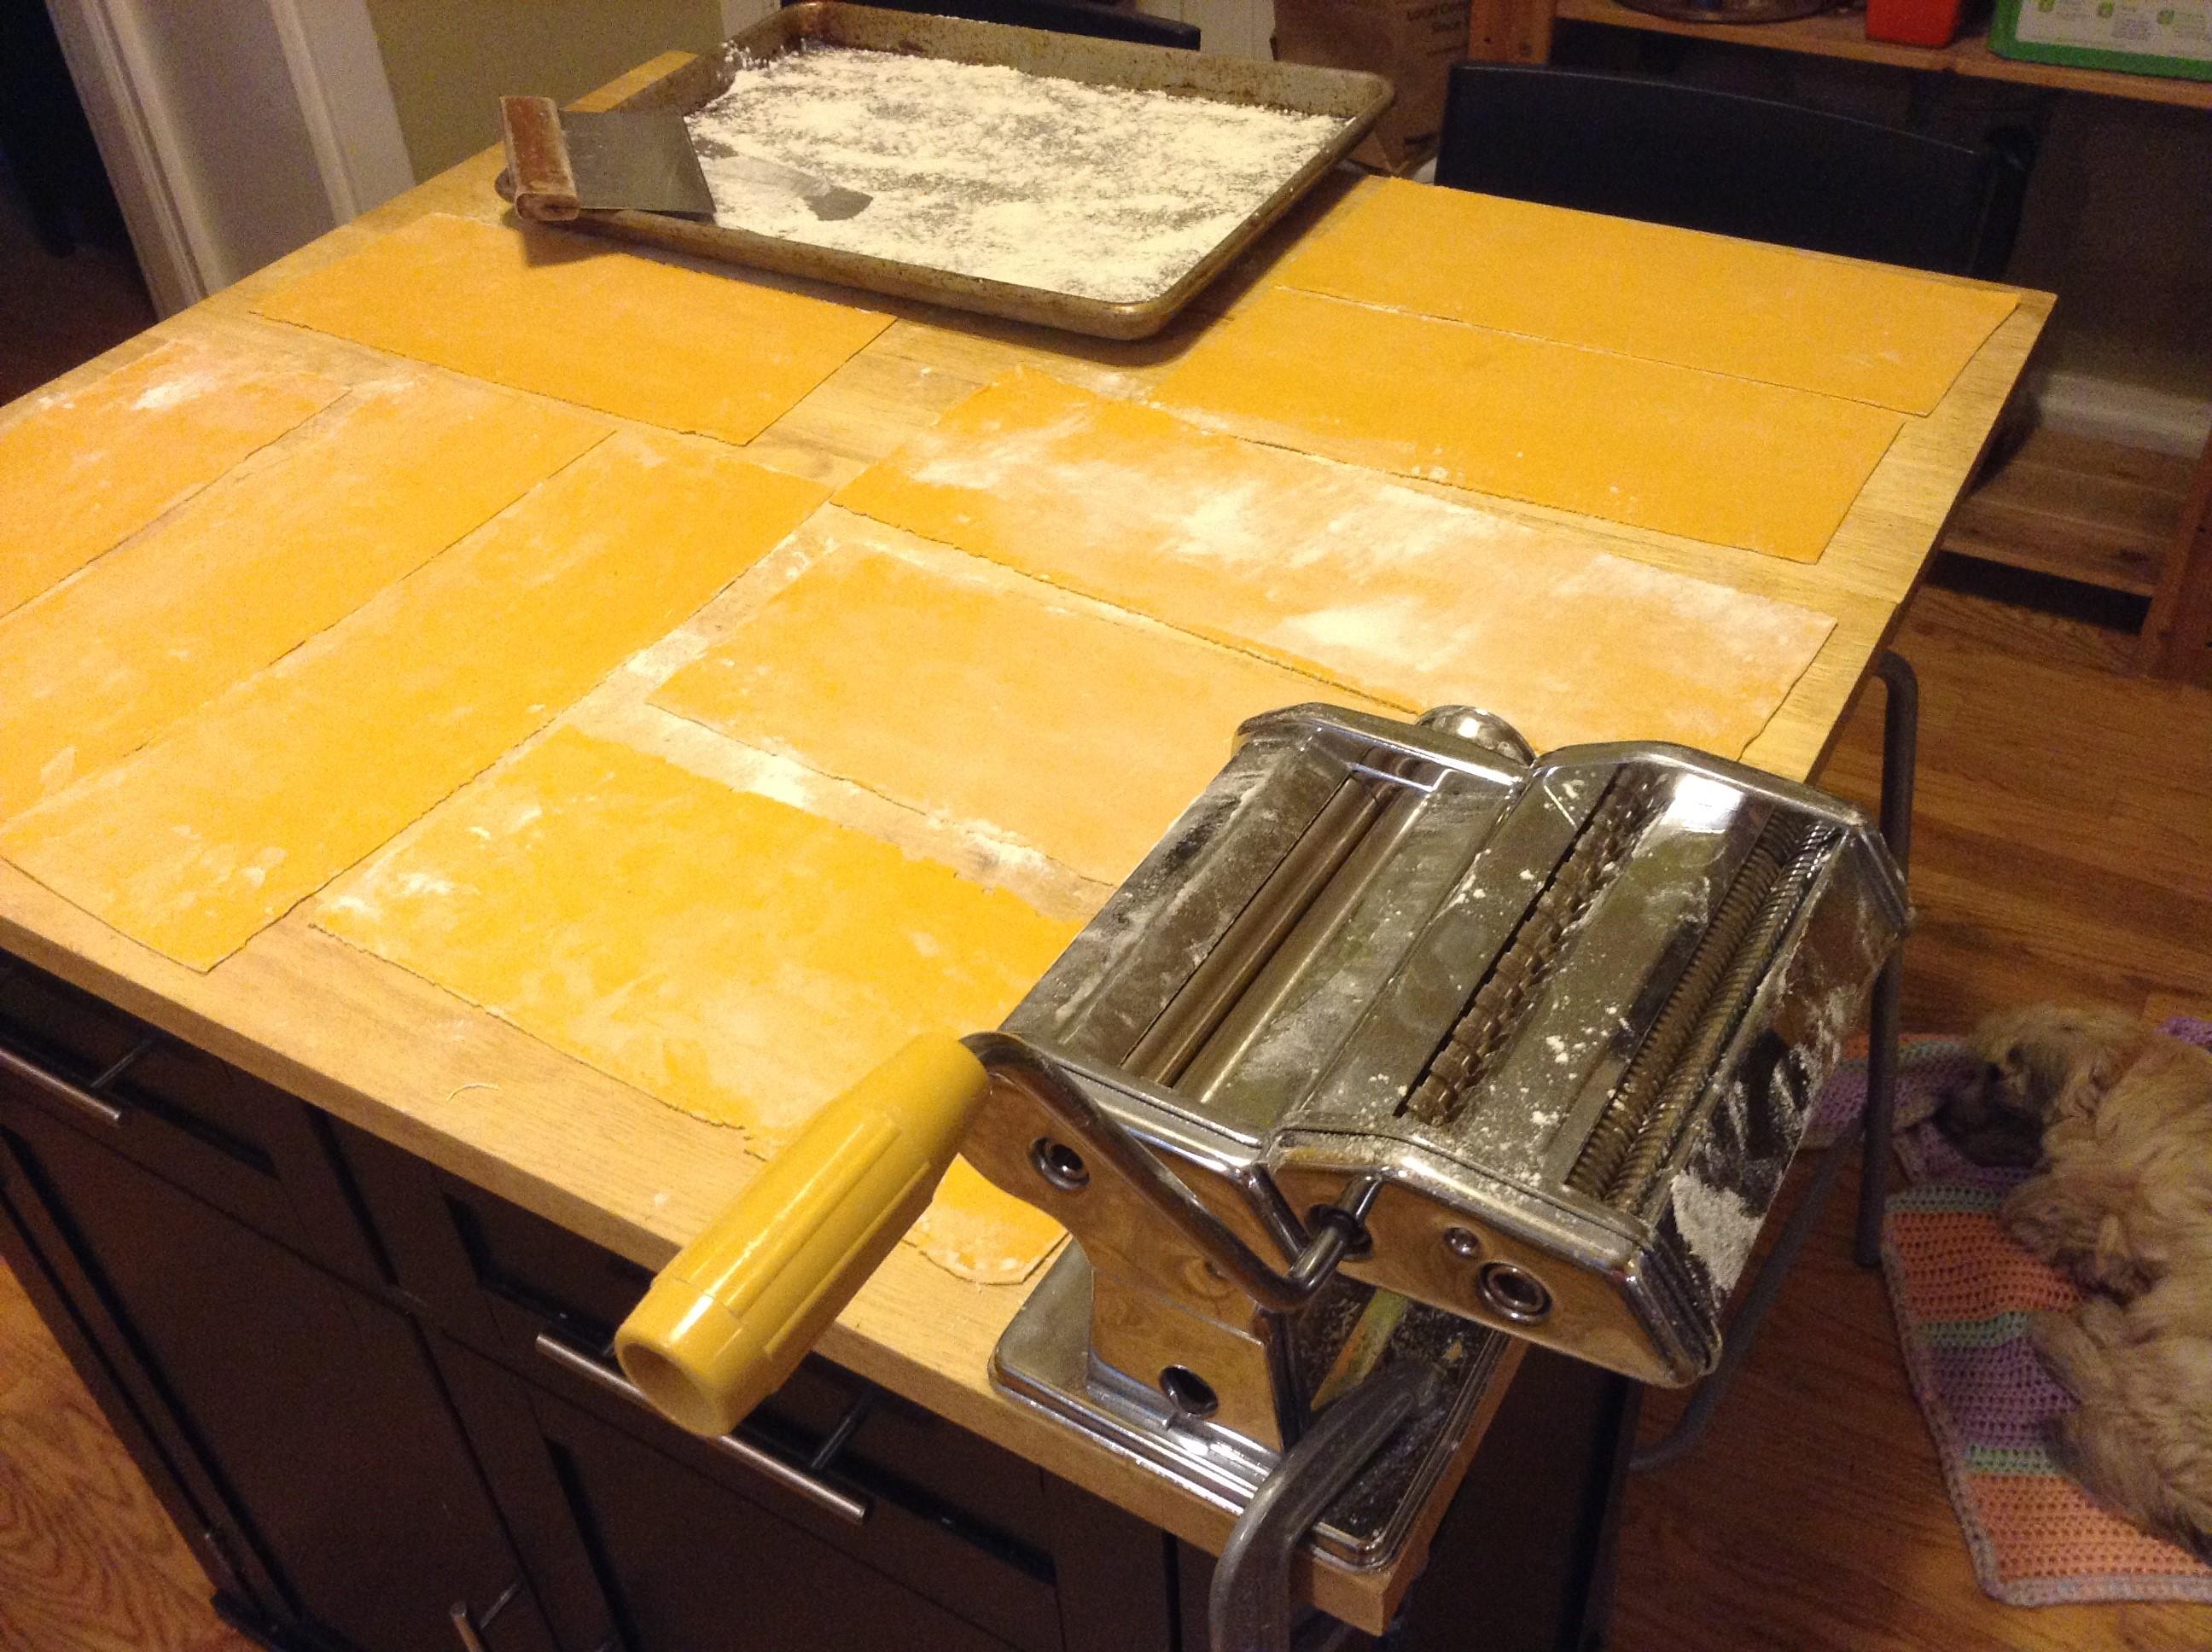 pasta dough sheets